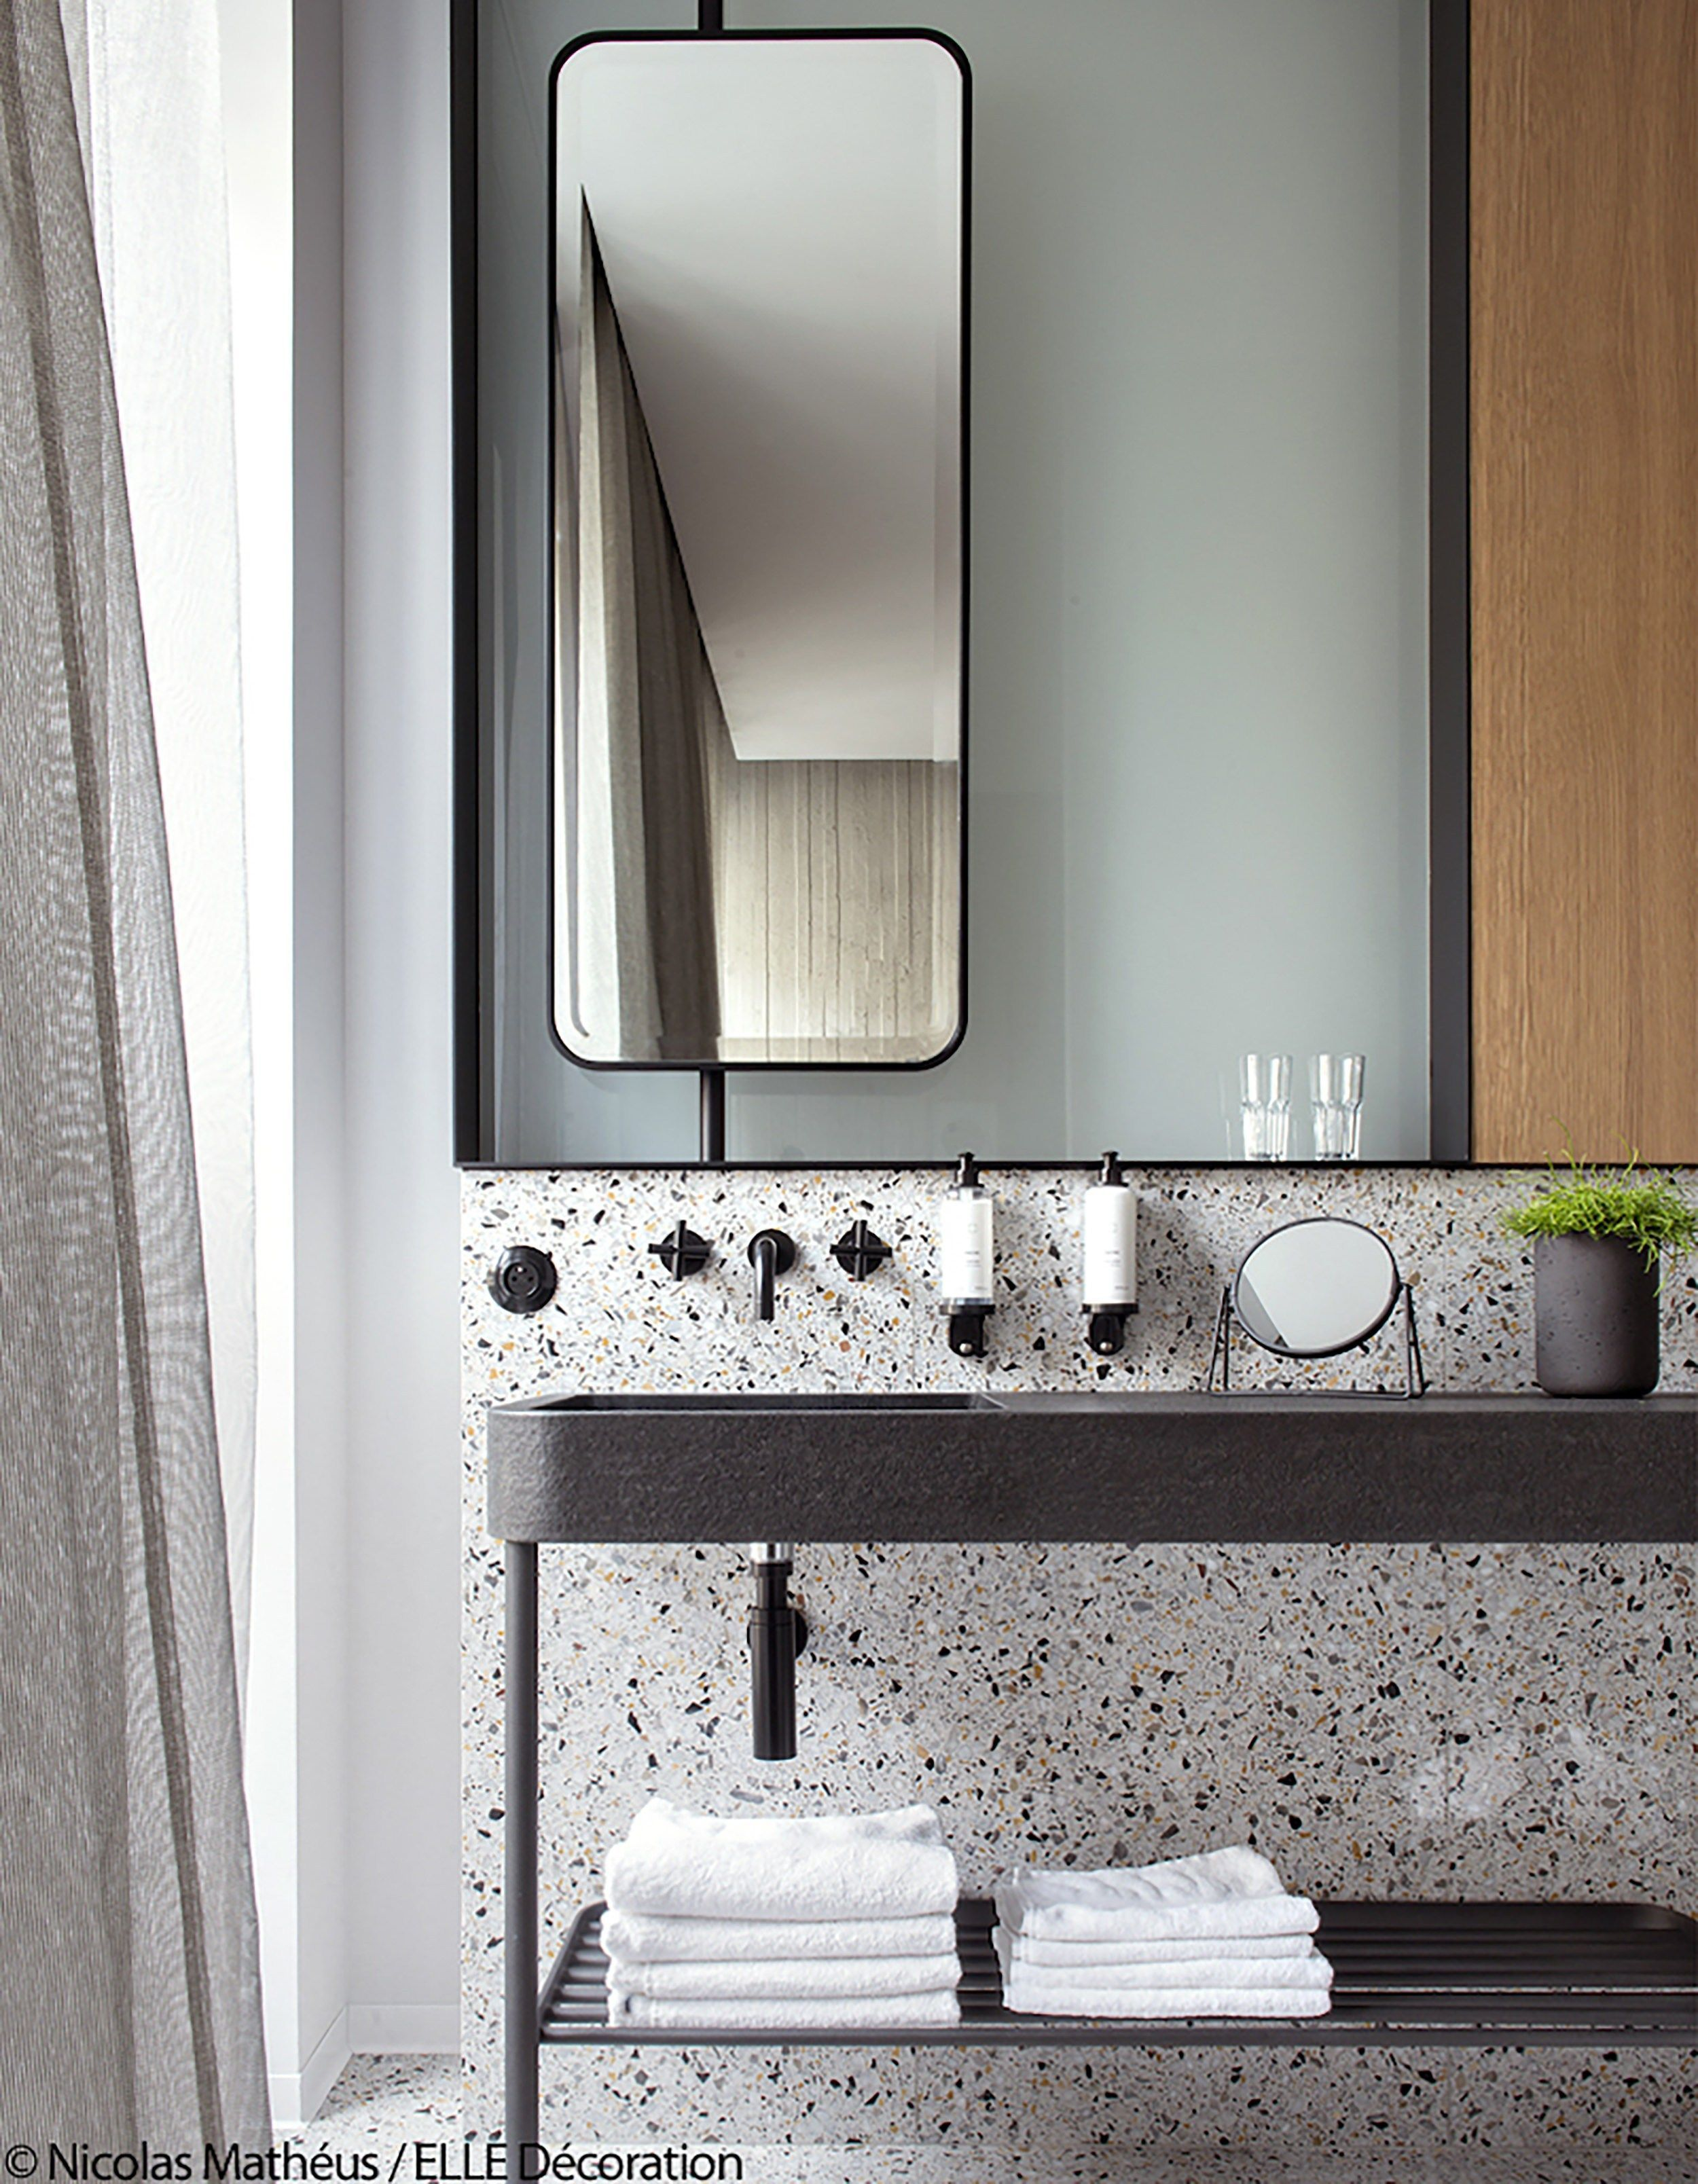 Delightful Bathroom Mirror 24 X 30 Decoration Ideas You Ll See In 2018 Bathroommirrordecor Mirrored Modern Bathroom Mirrors Bathroom Mirror Bathroom Decor